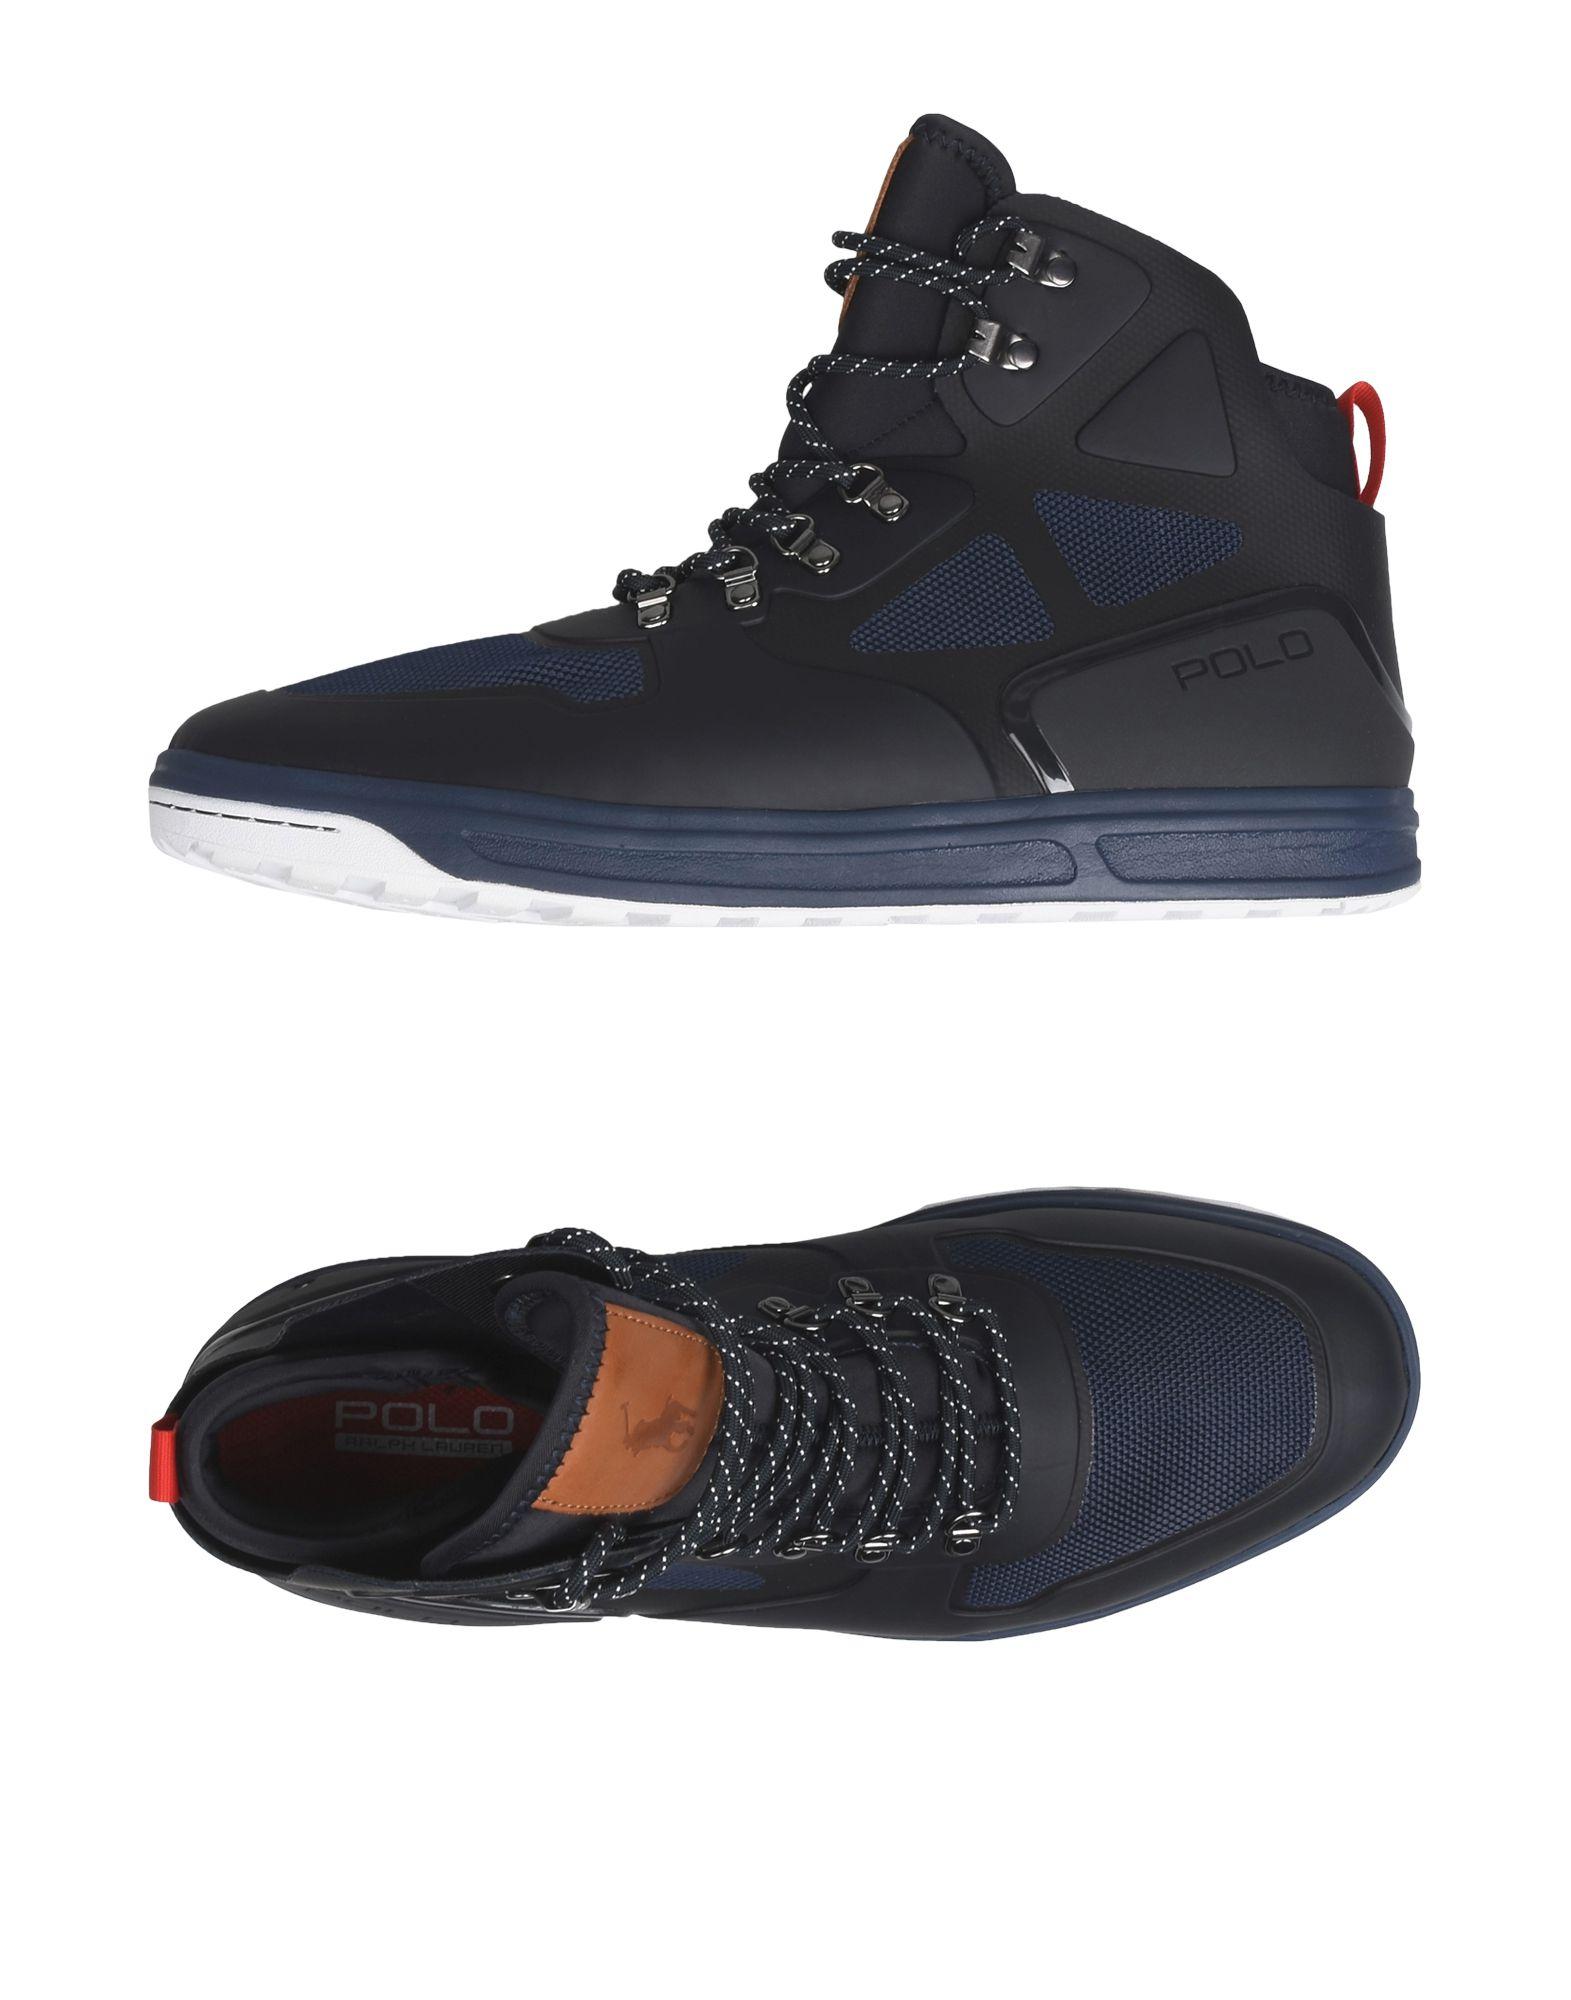 Polo Ralph Lauren Sneakers Herren  11355615PA Gute Qualität beliebte Schuhe